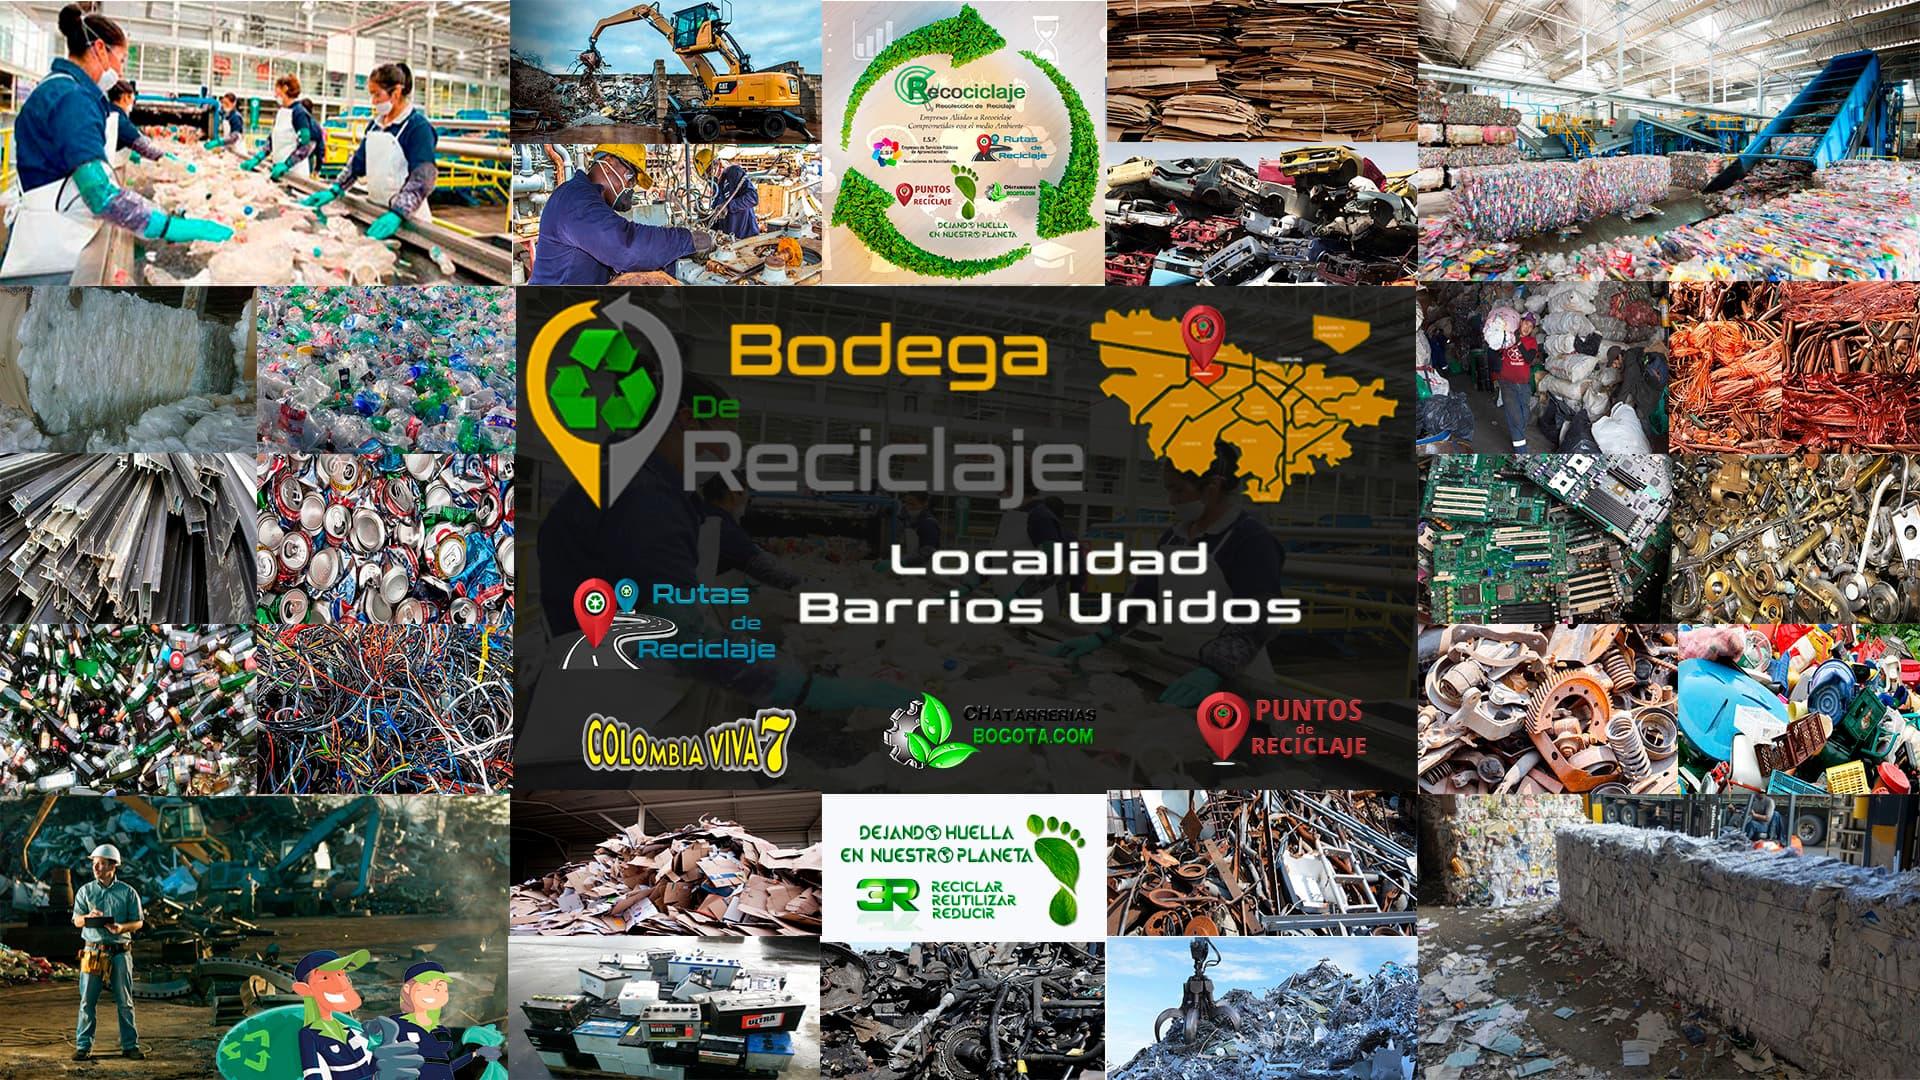 Bodega de Reciclaje Barrios Unidos